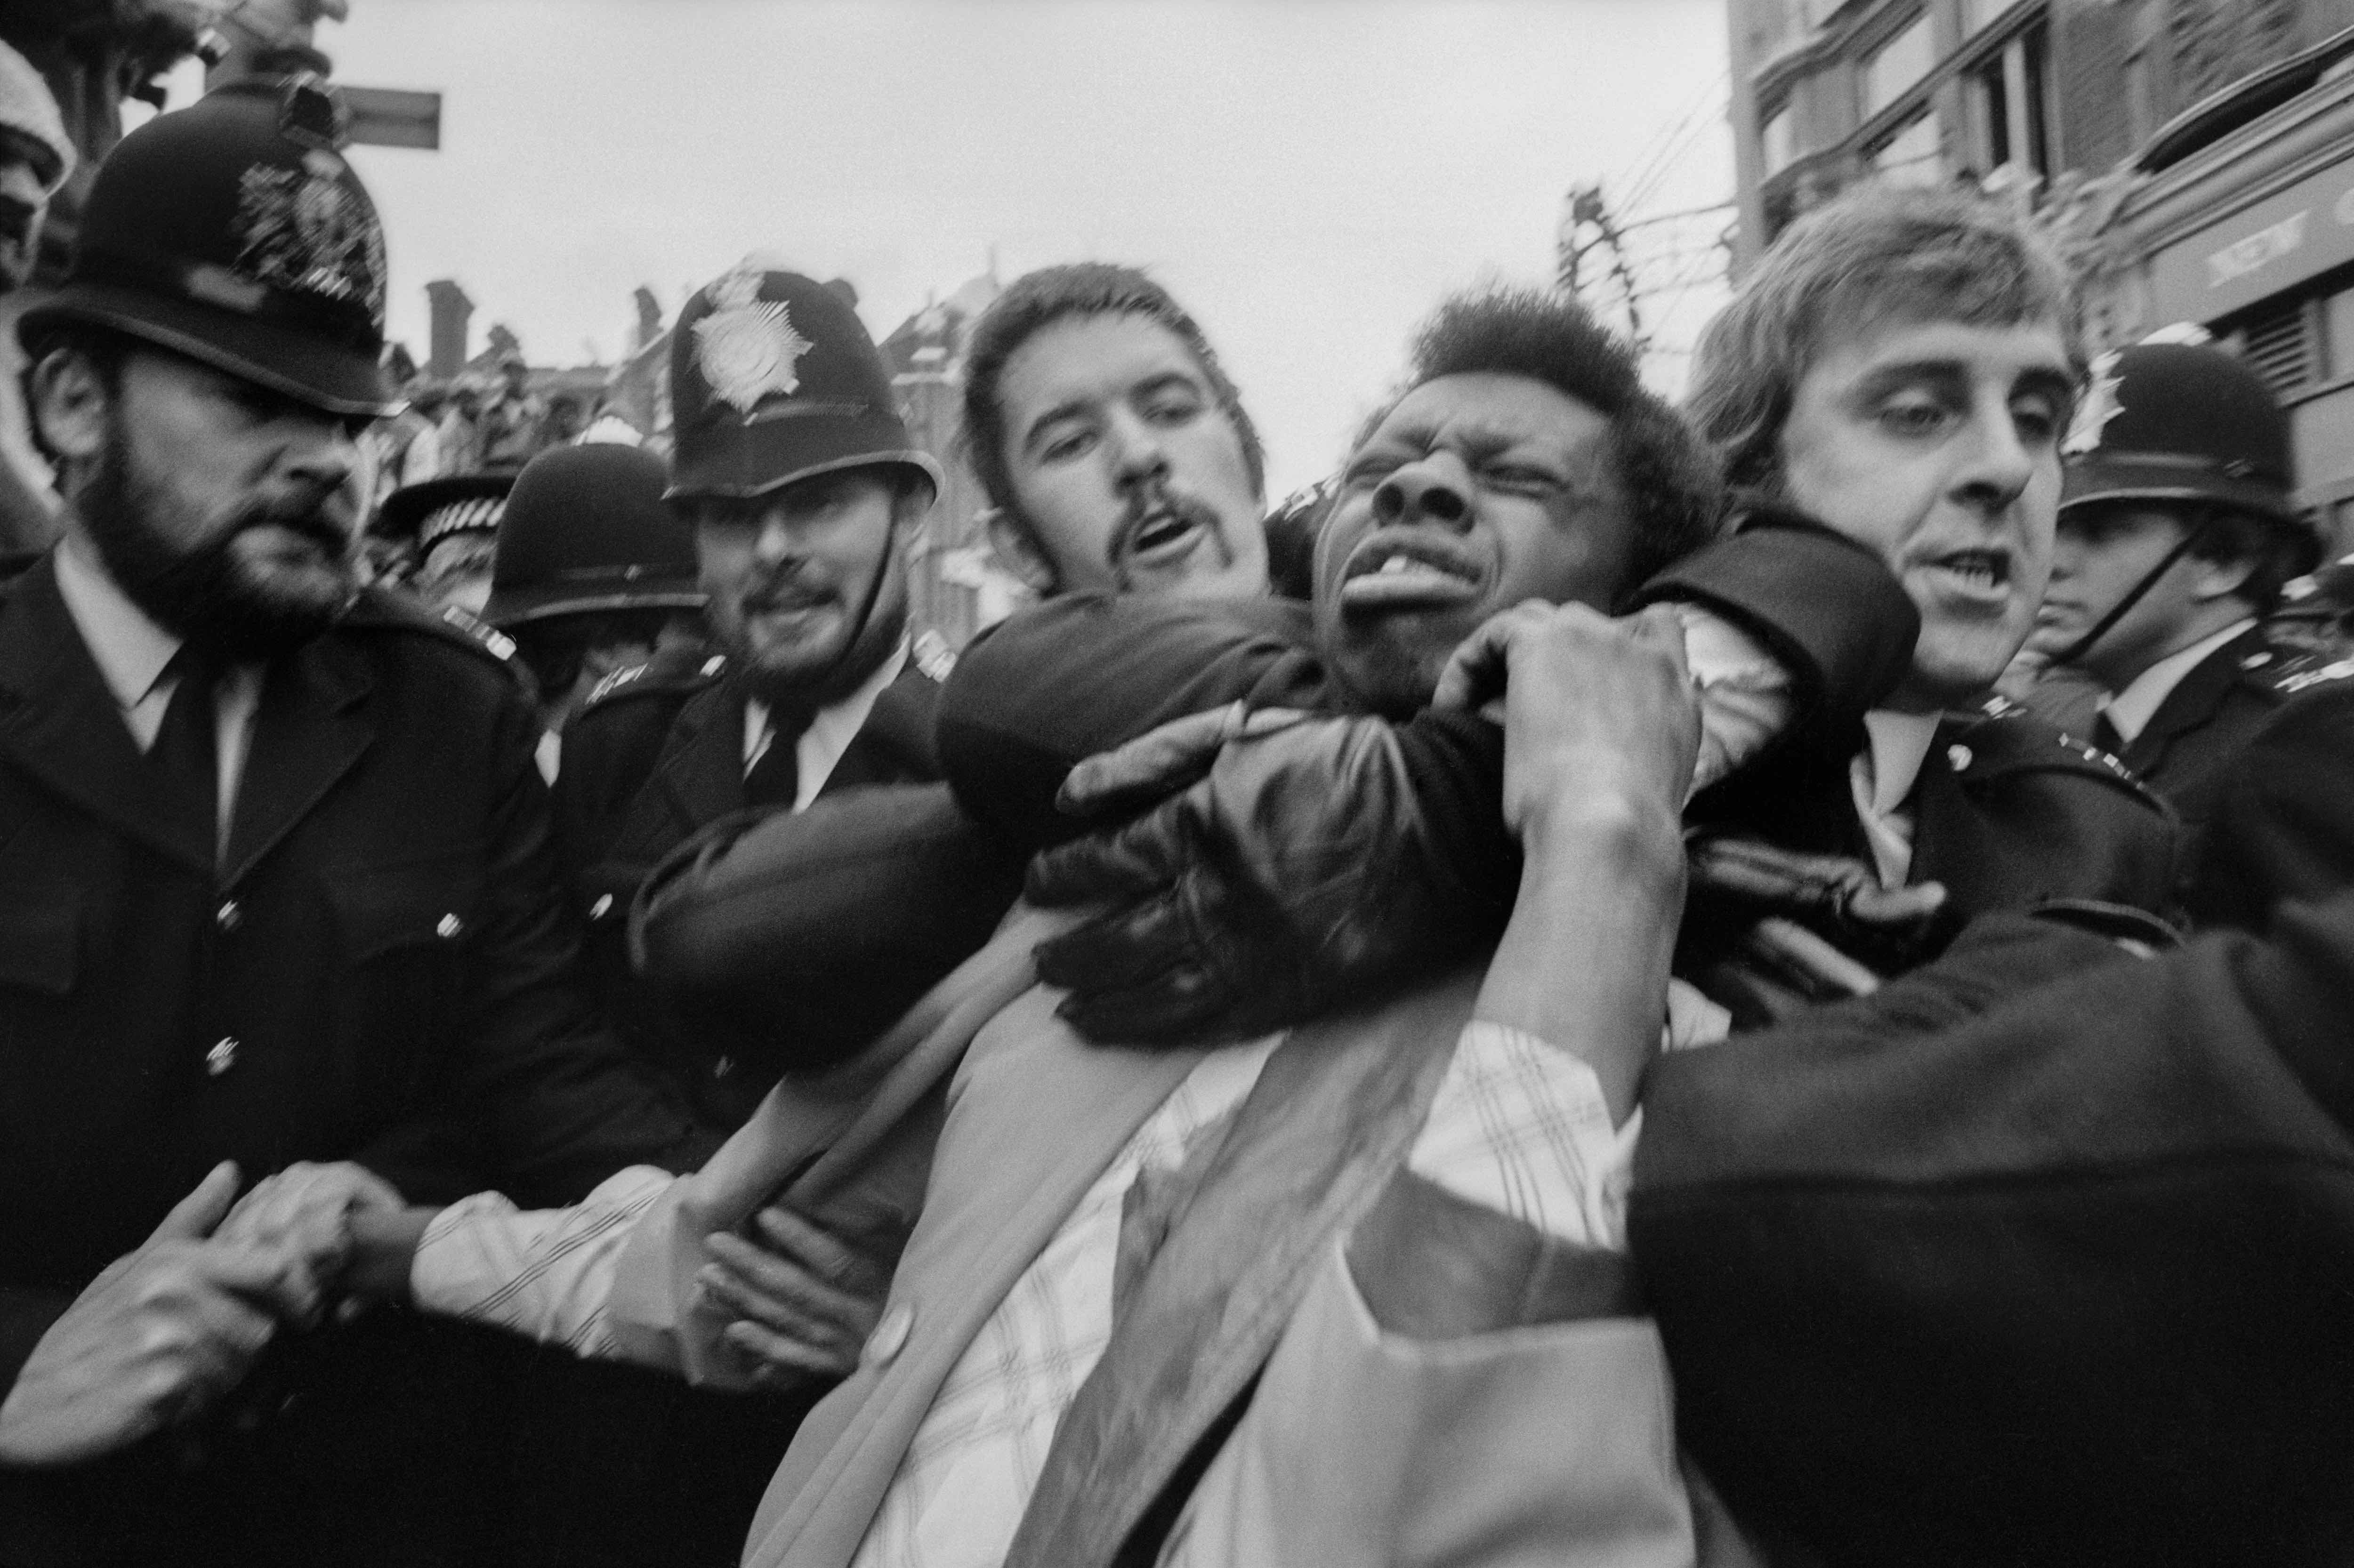 GB. ENGLAND. London. Race Riots in Lewisham. Police making an arrest. 1977.